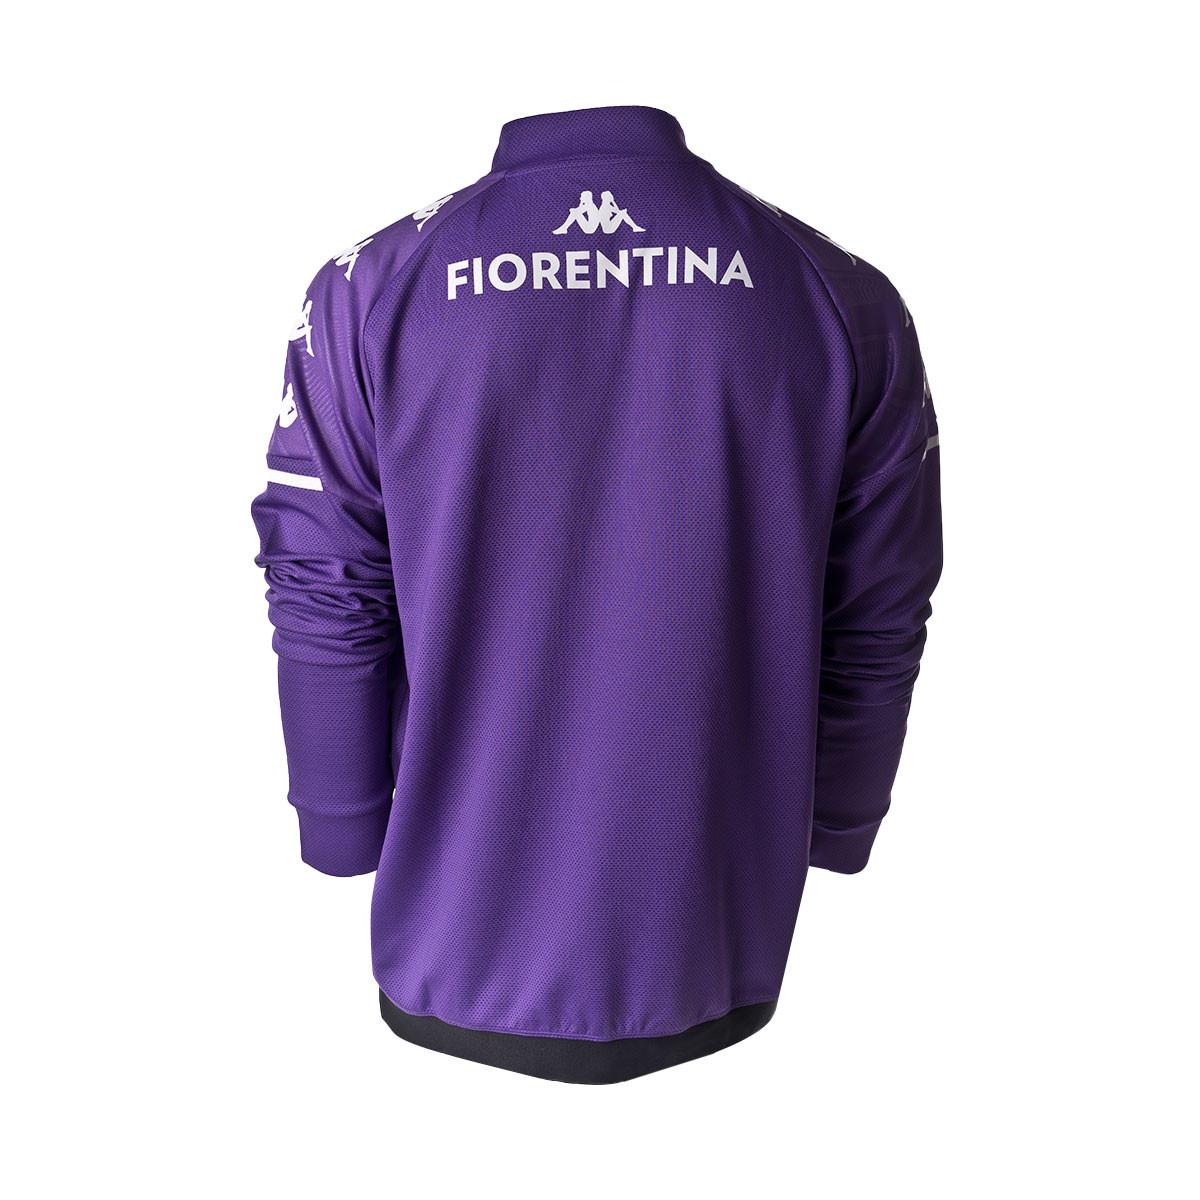 Felpa Kappa ACF Fiorentina Training 2020-2021